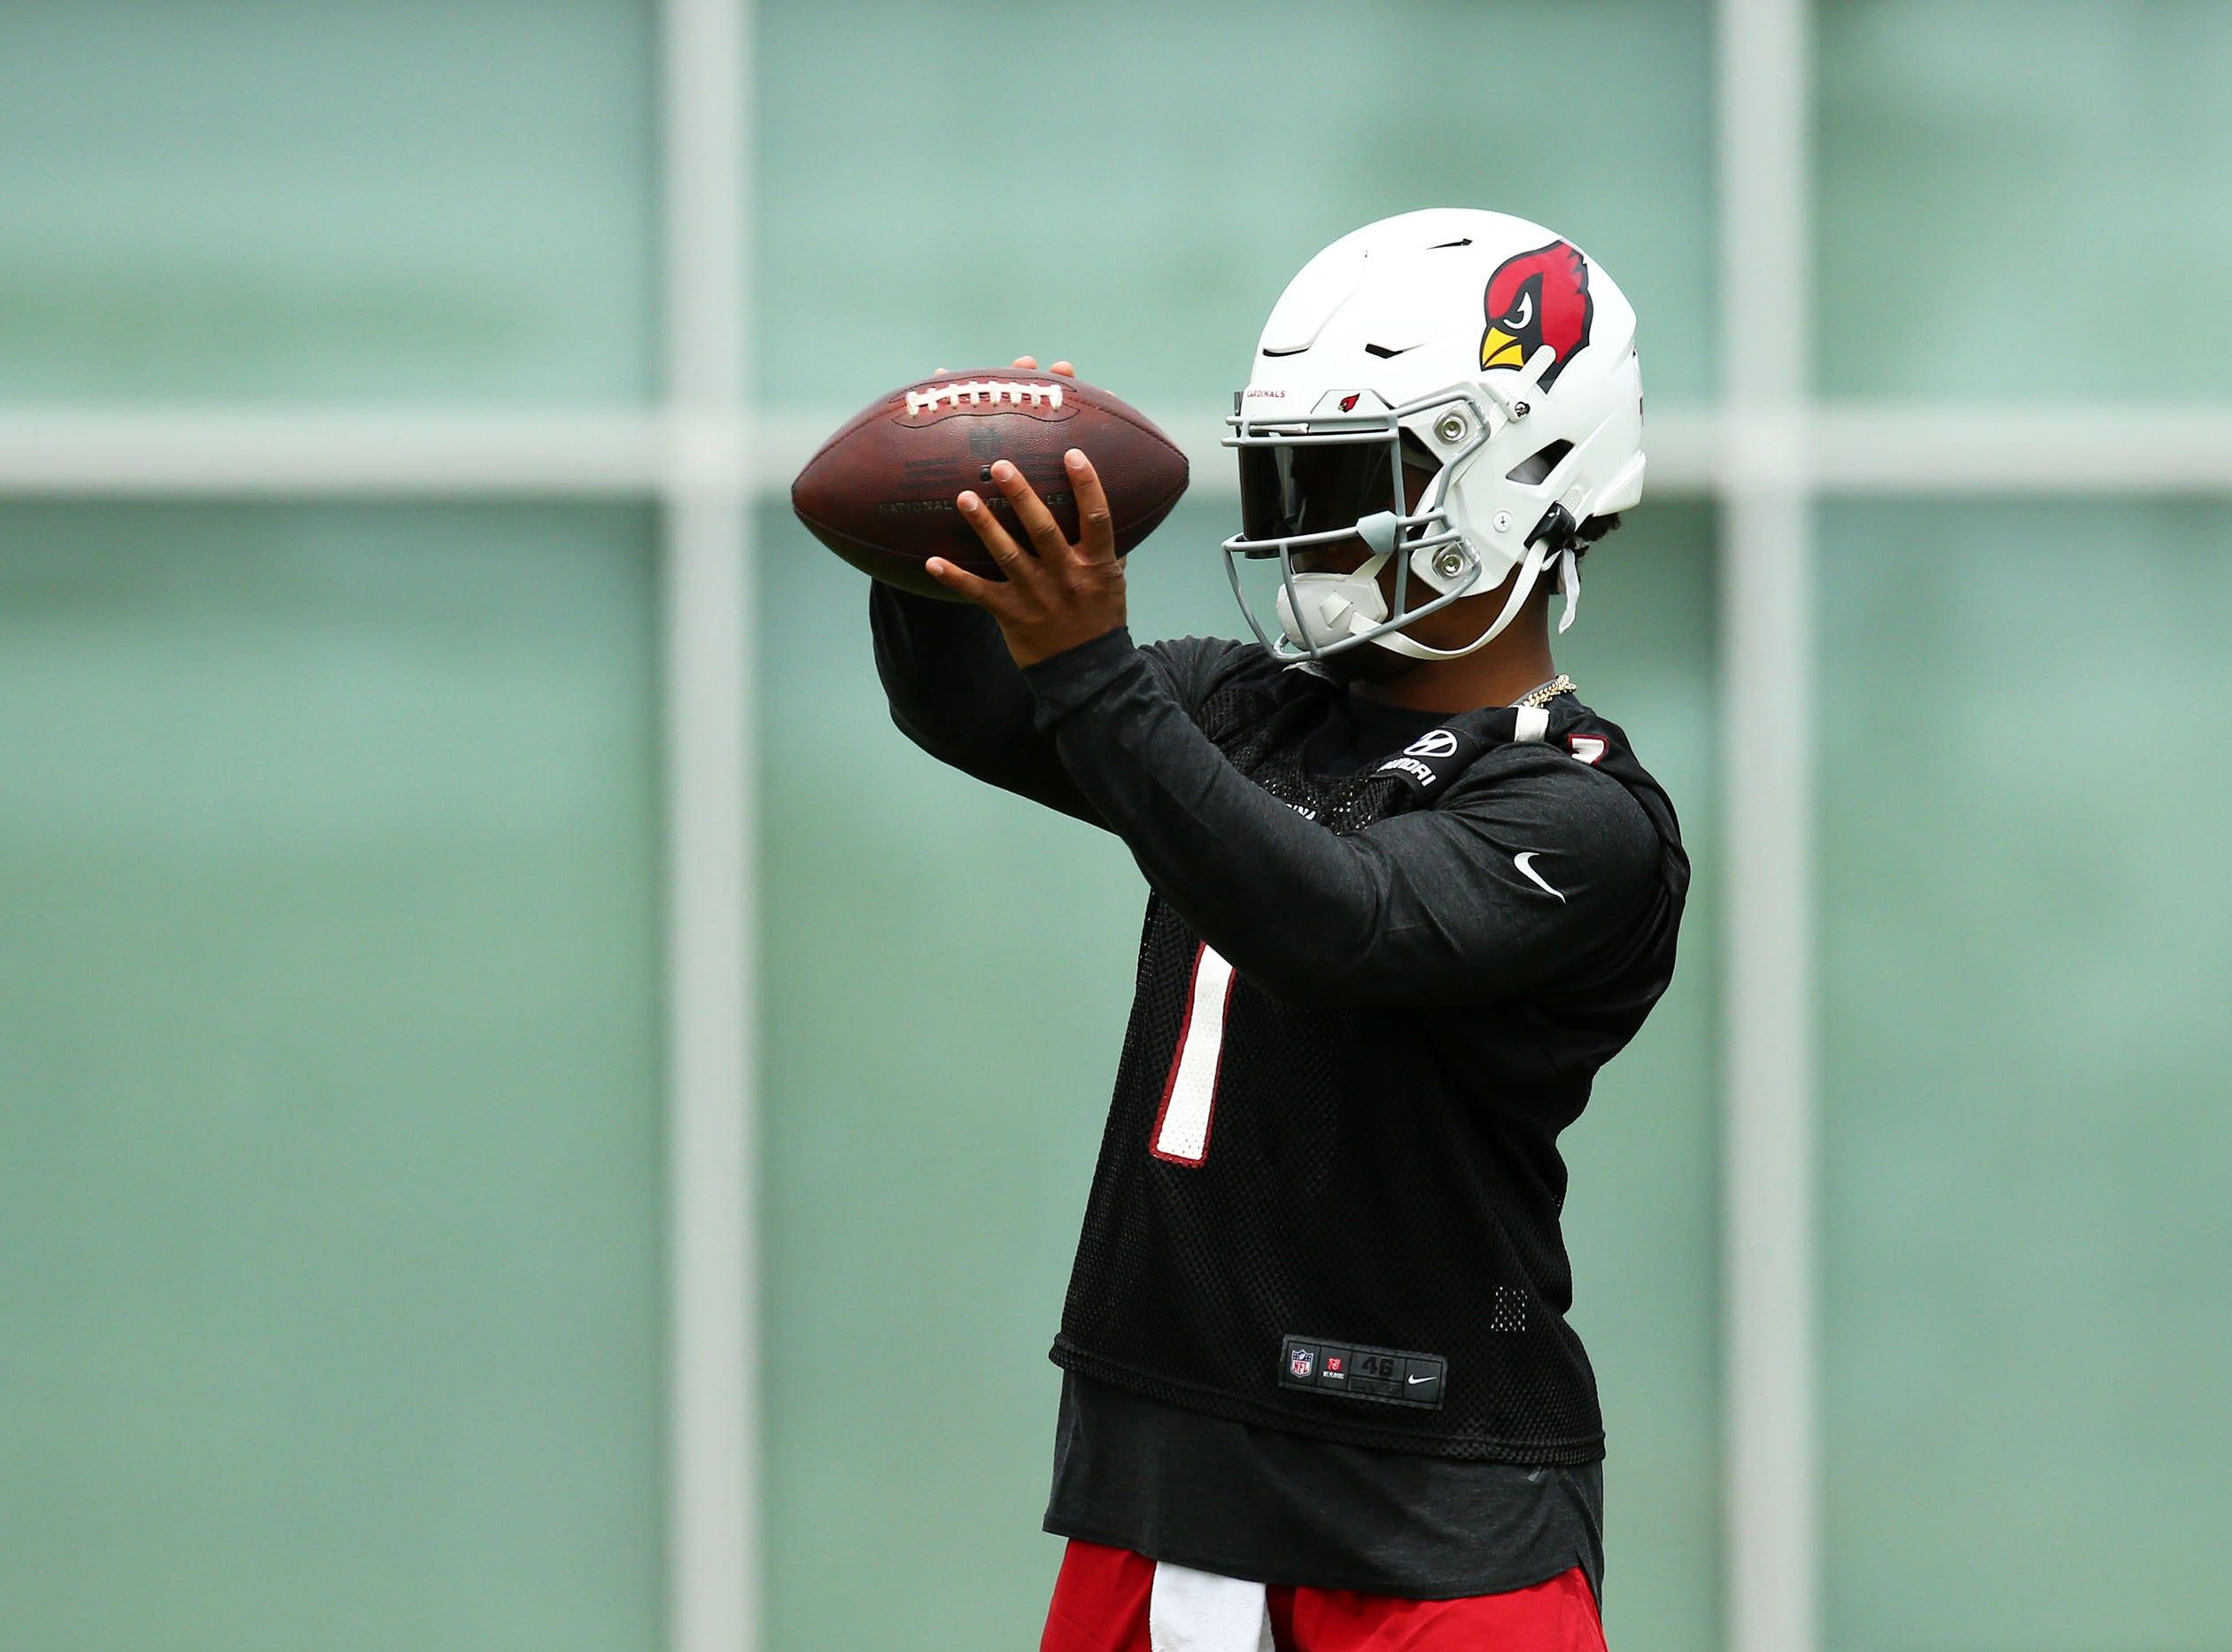 Cardinals quarterback Kyler Murray makes his debut at rookie minicamp on May 10.